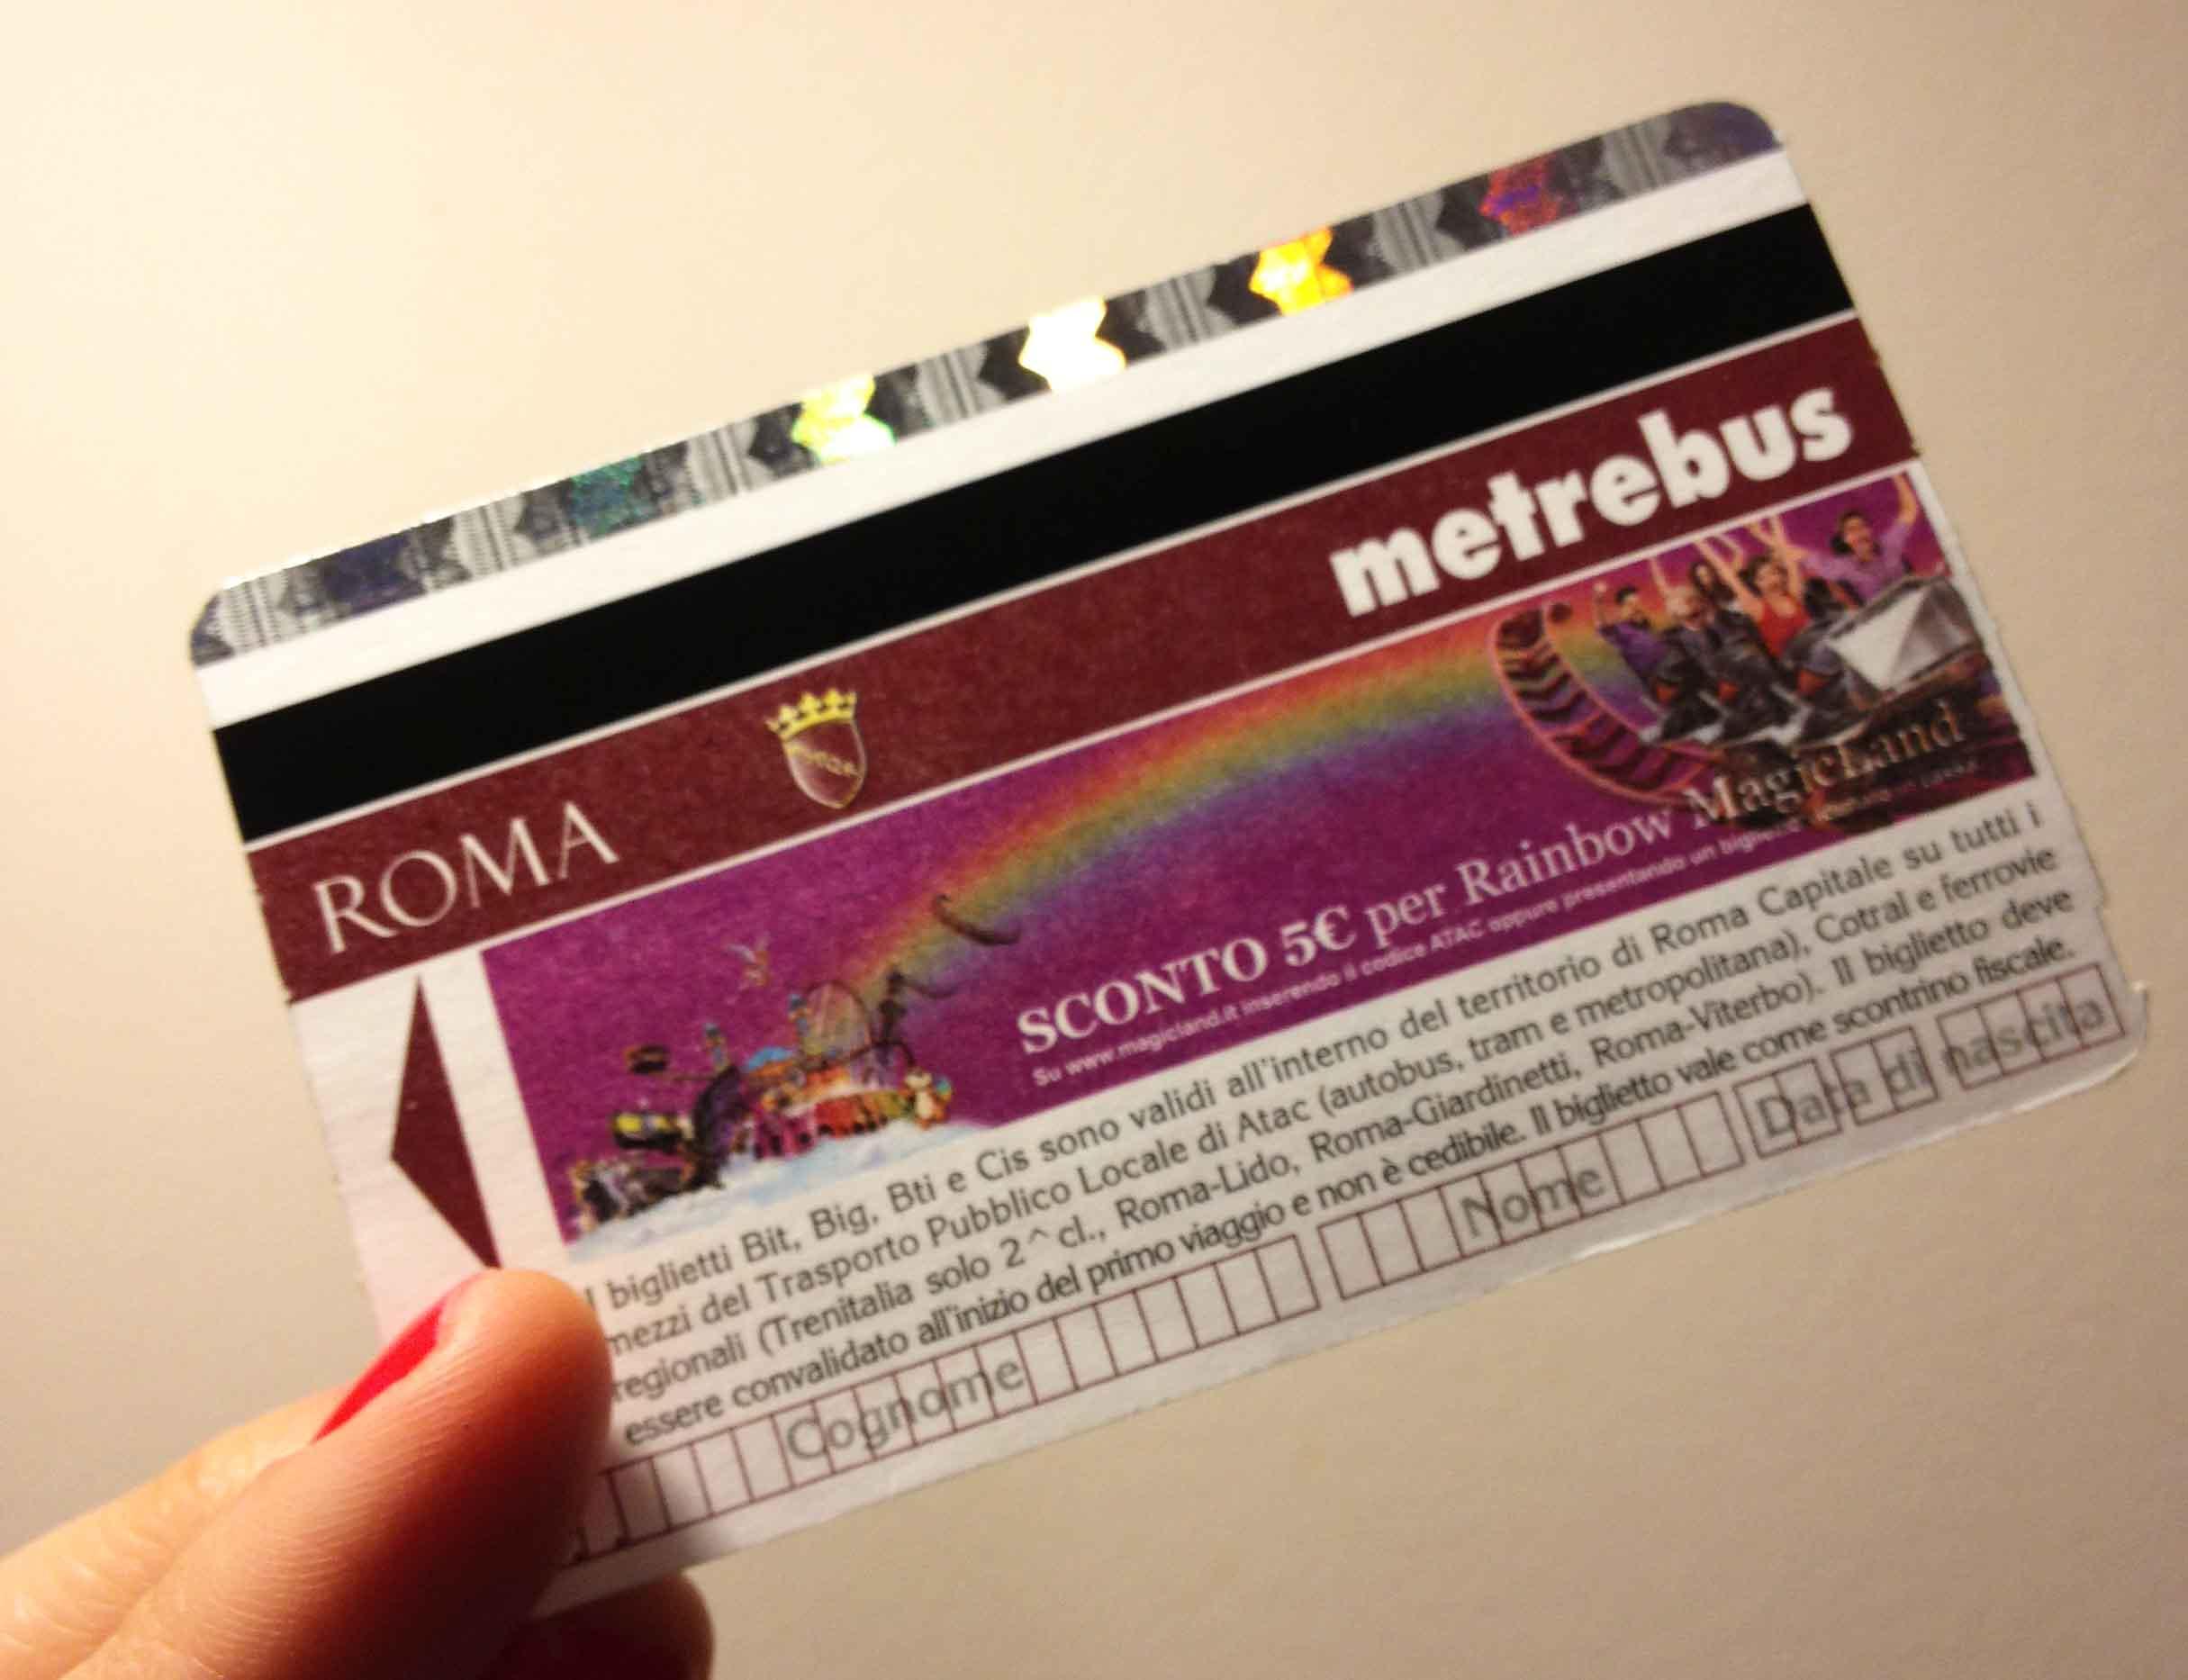 Проездной в метро Рима